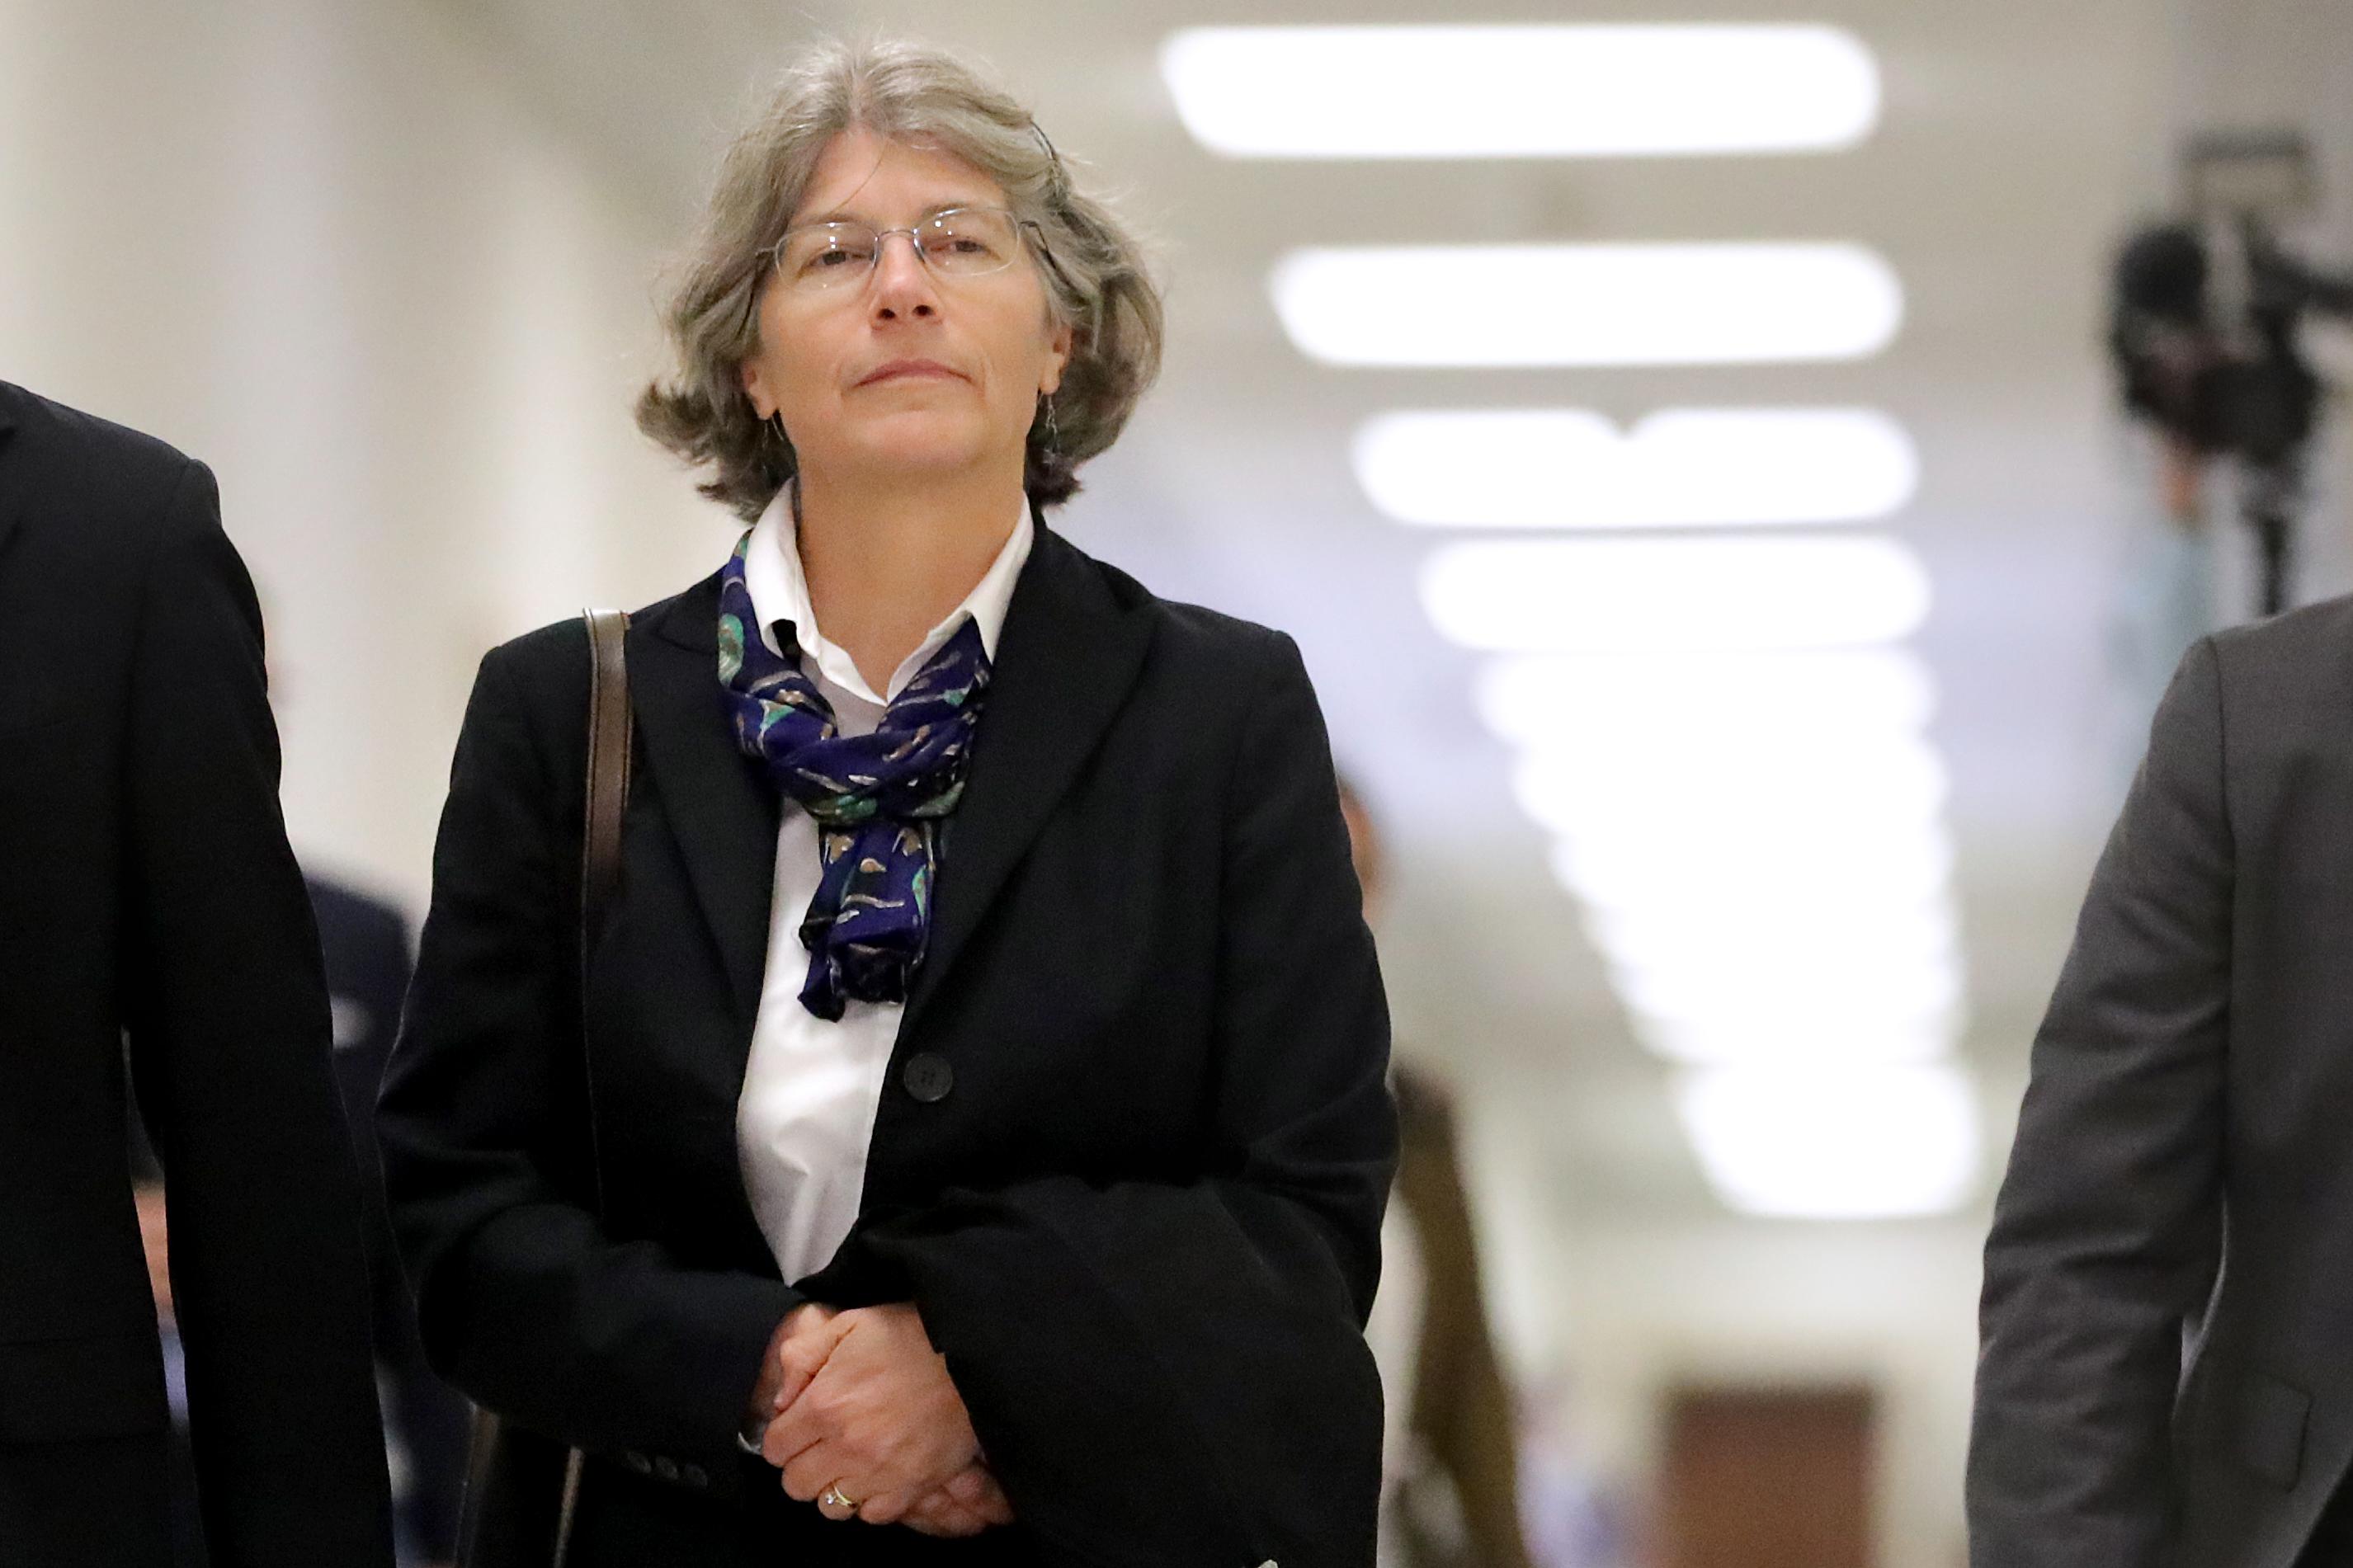 New Docs Show Bruce Ohr Linked Wife Nellie to DOJ Intelligence Adviser, Prosecutors